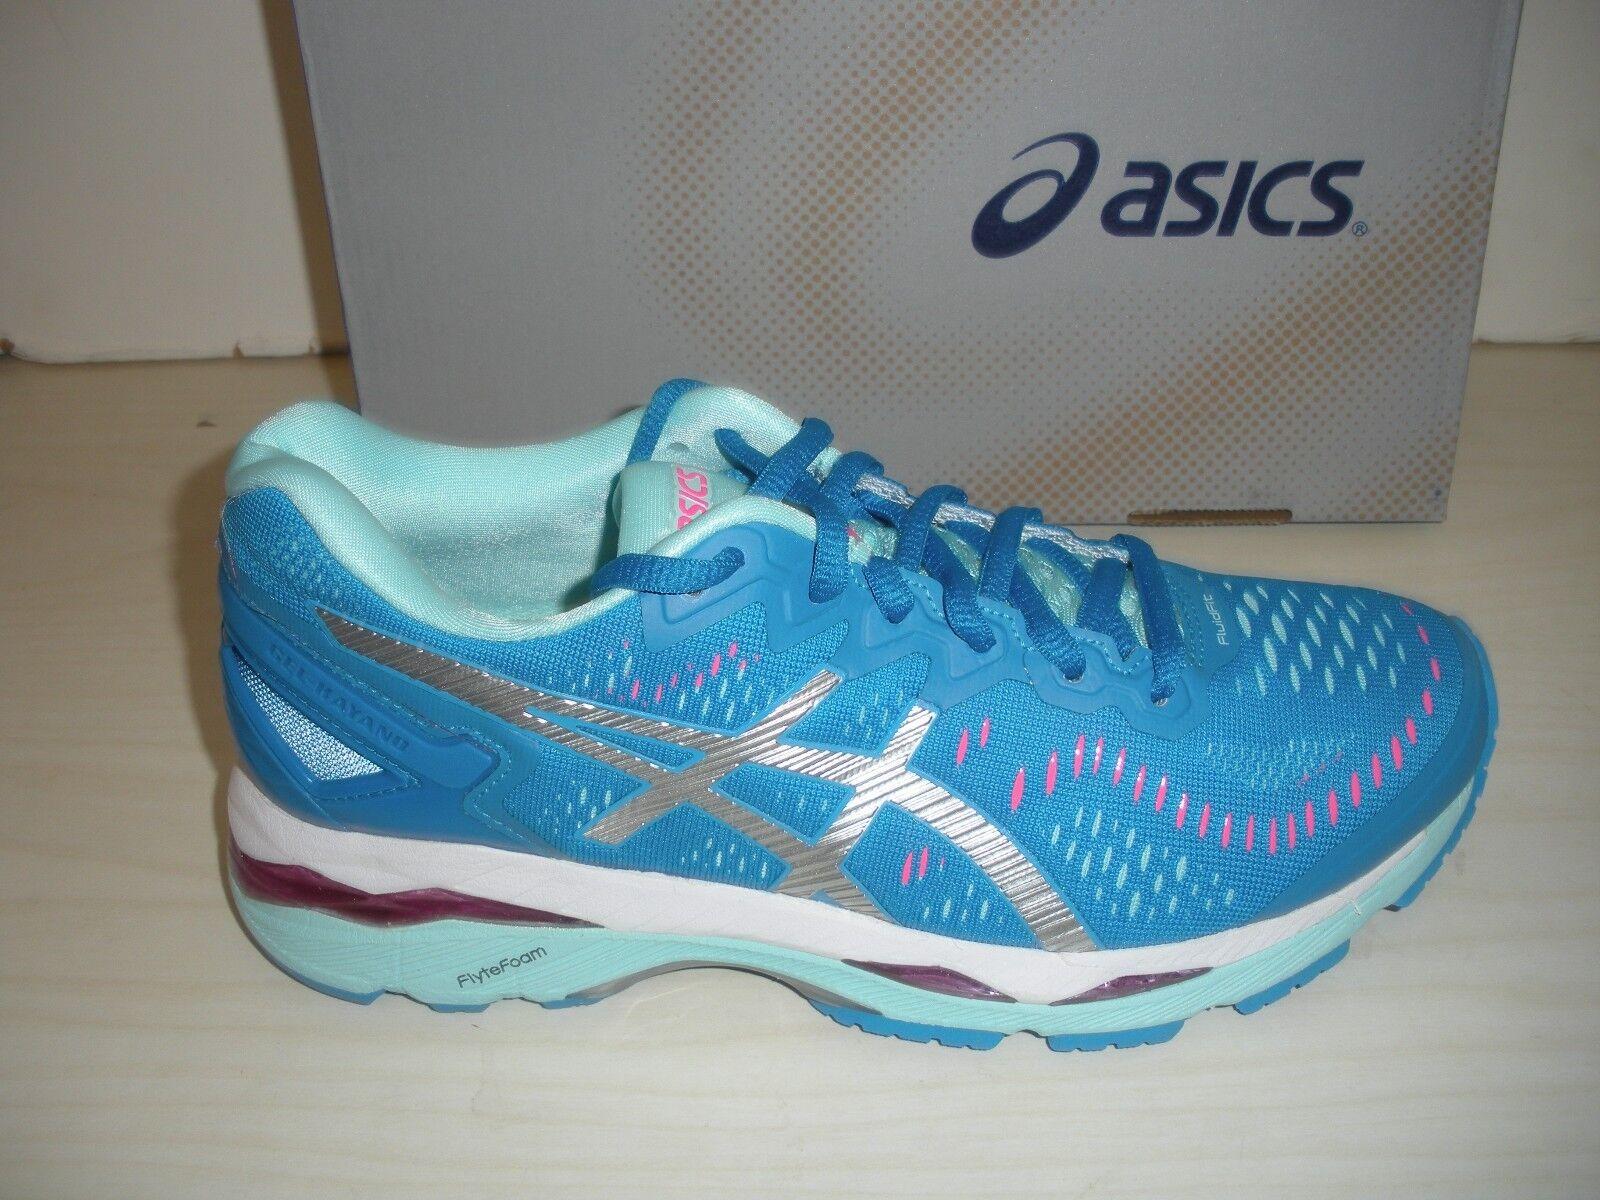 ASICS damen GEL-KAYANO 23 RUNNING Turnschuhe-schuhe-T696N -4393- DIVA Blau Blau Blau 4b2f02